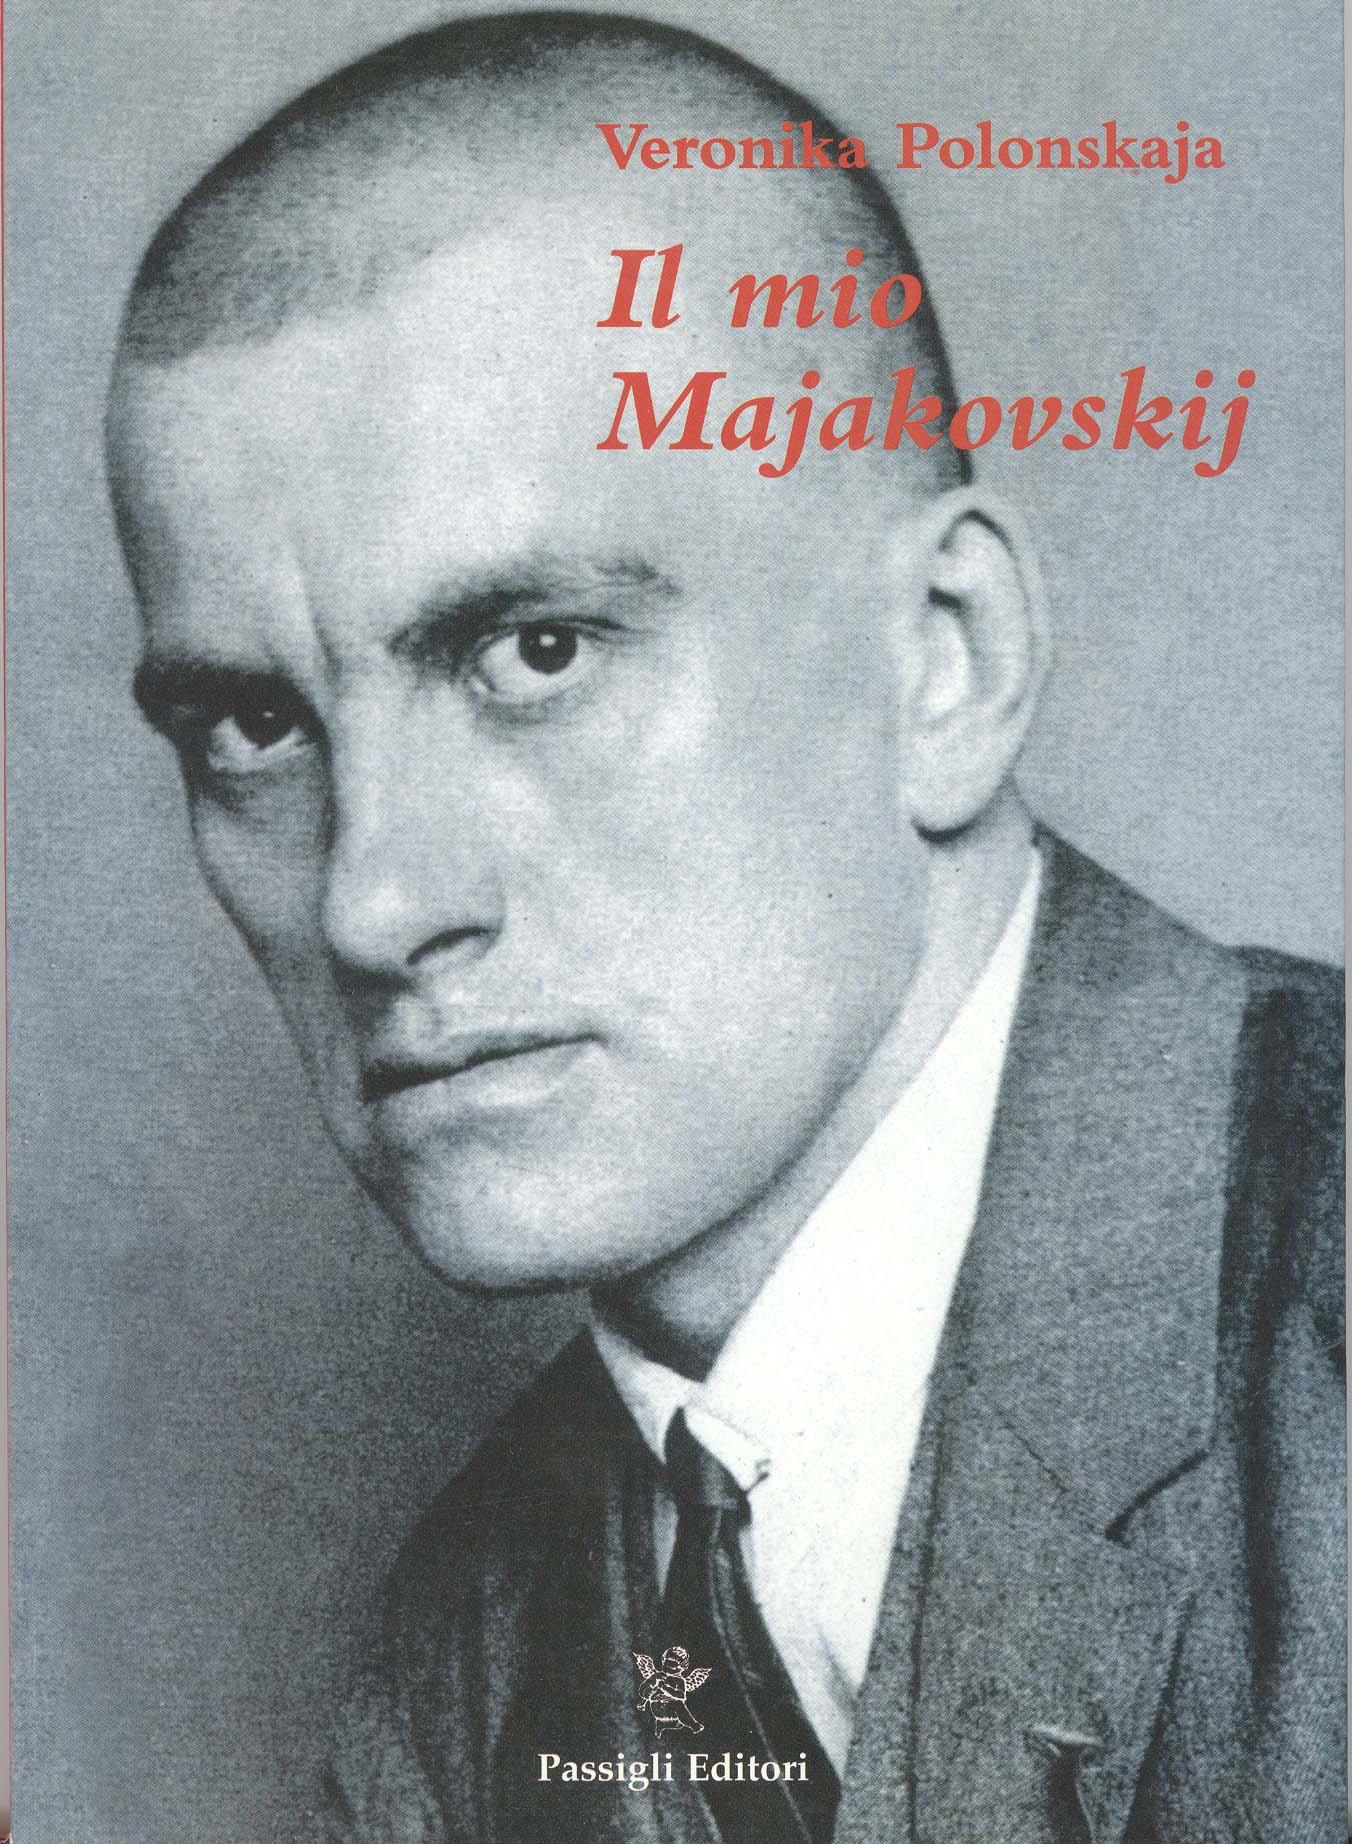 Il mio Majakovskij